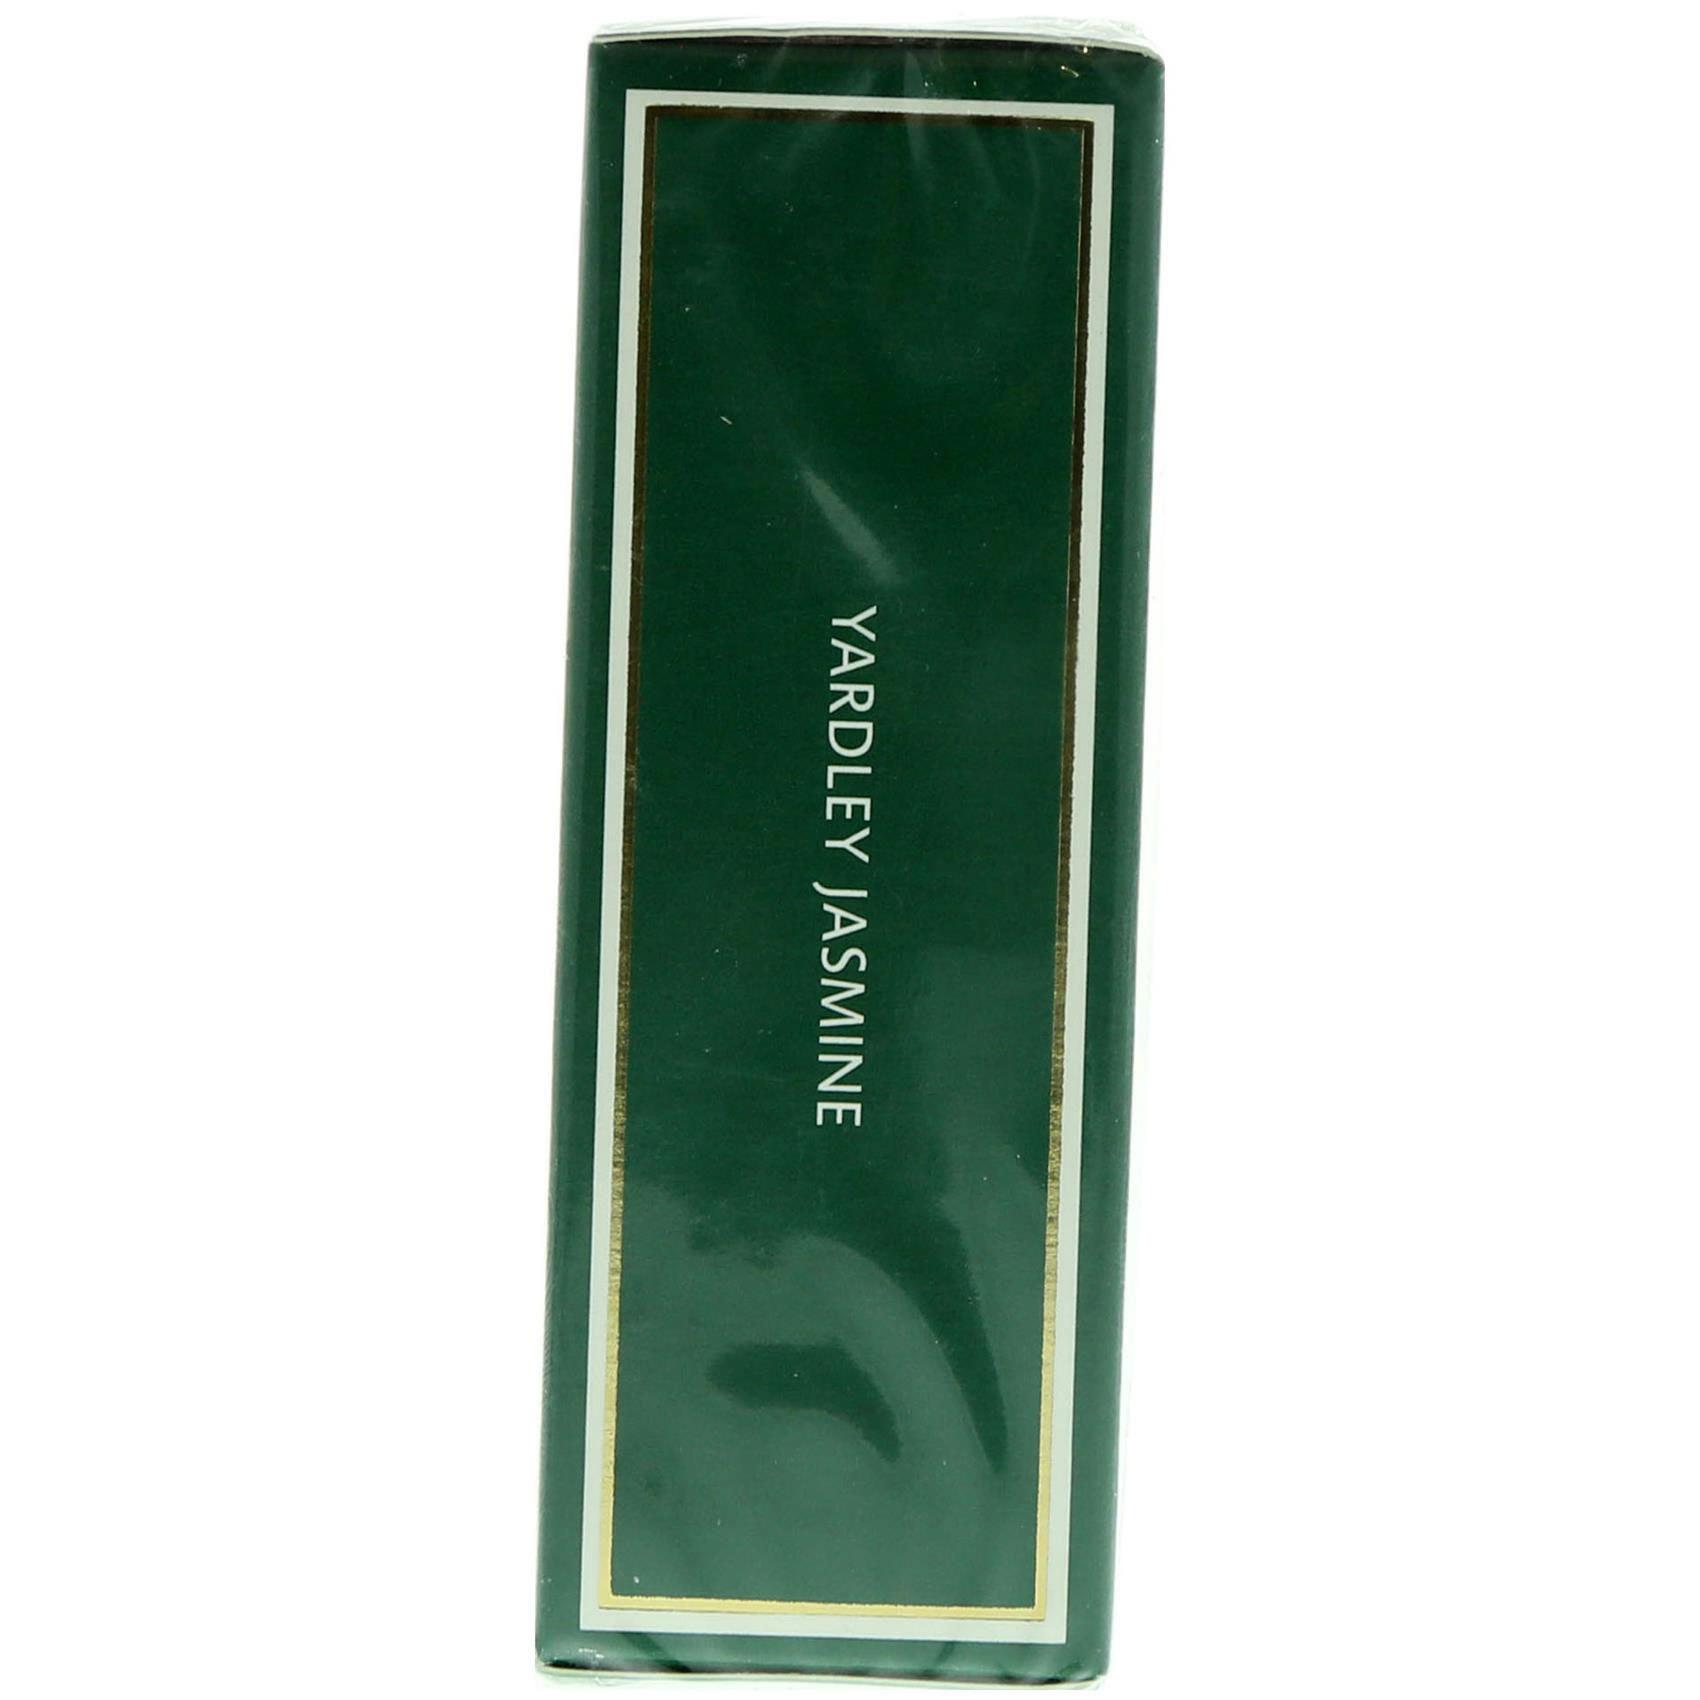 YARDLEY SOAP JASMINE 100GM